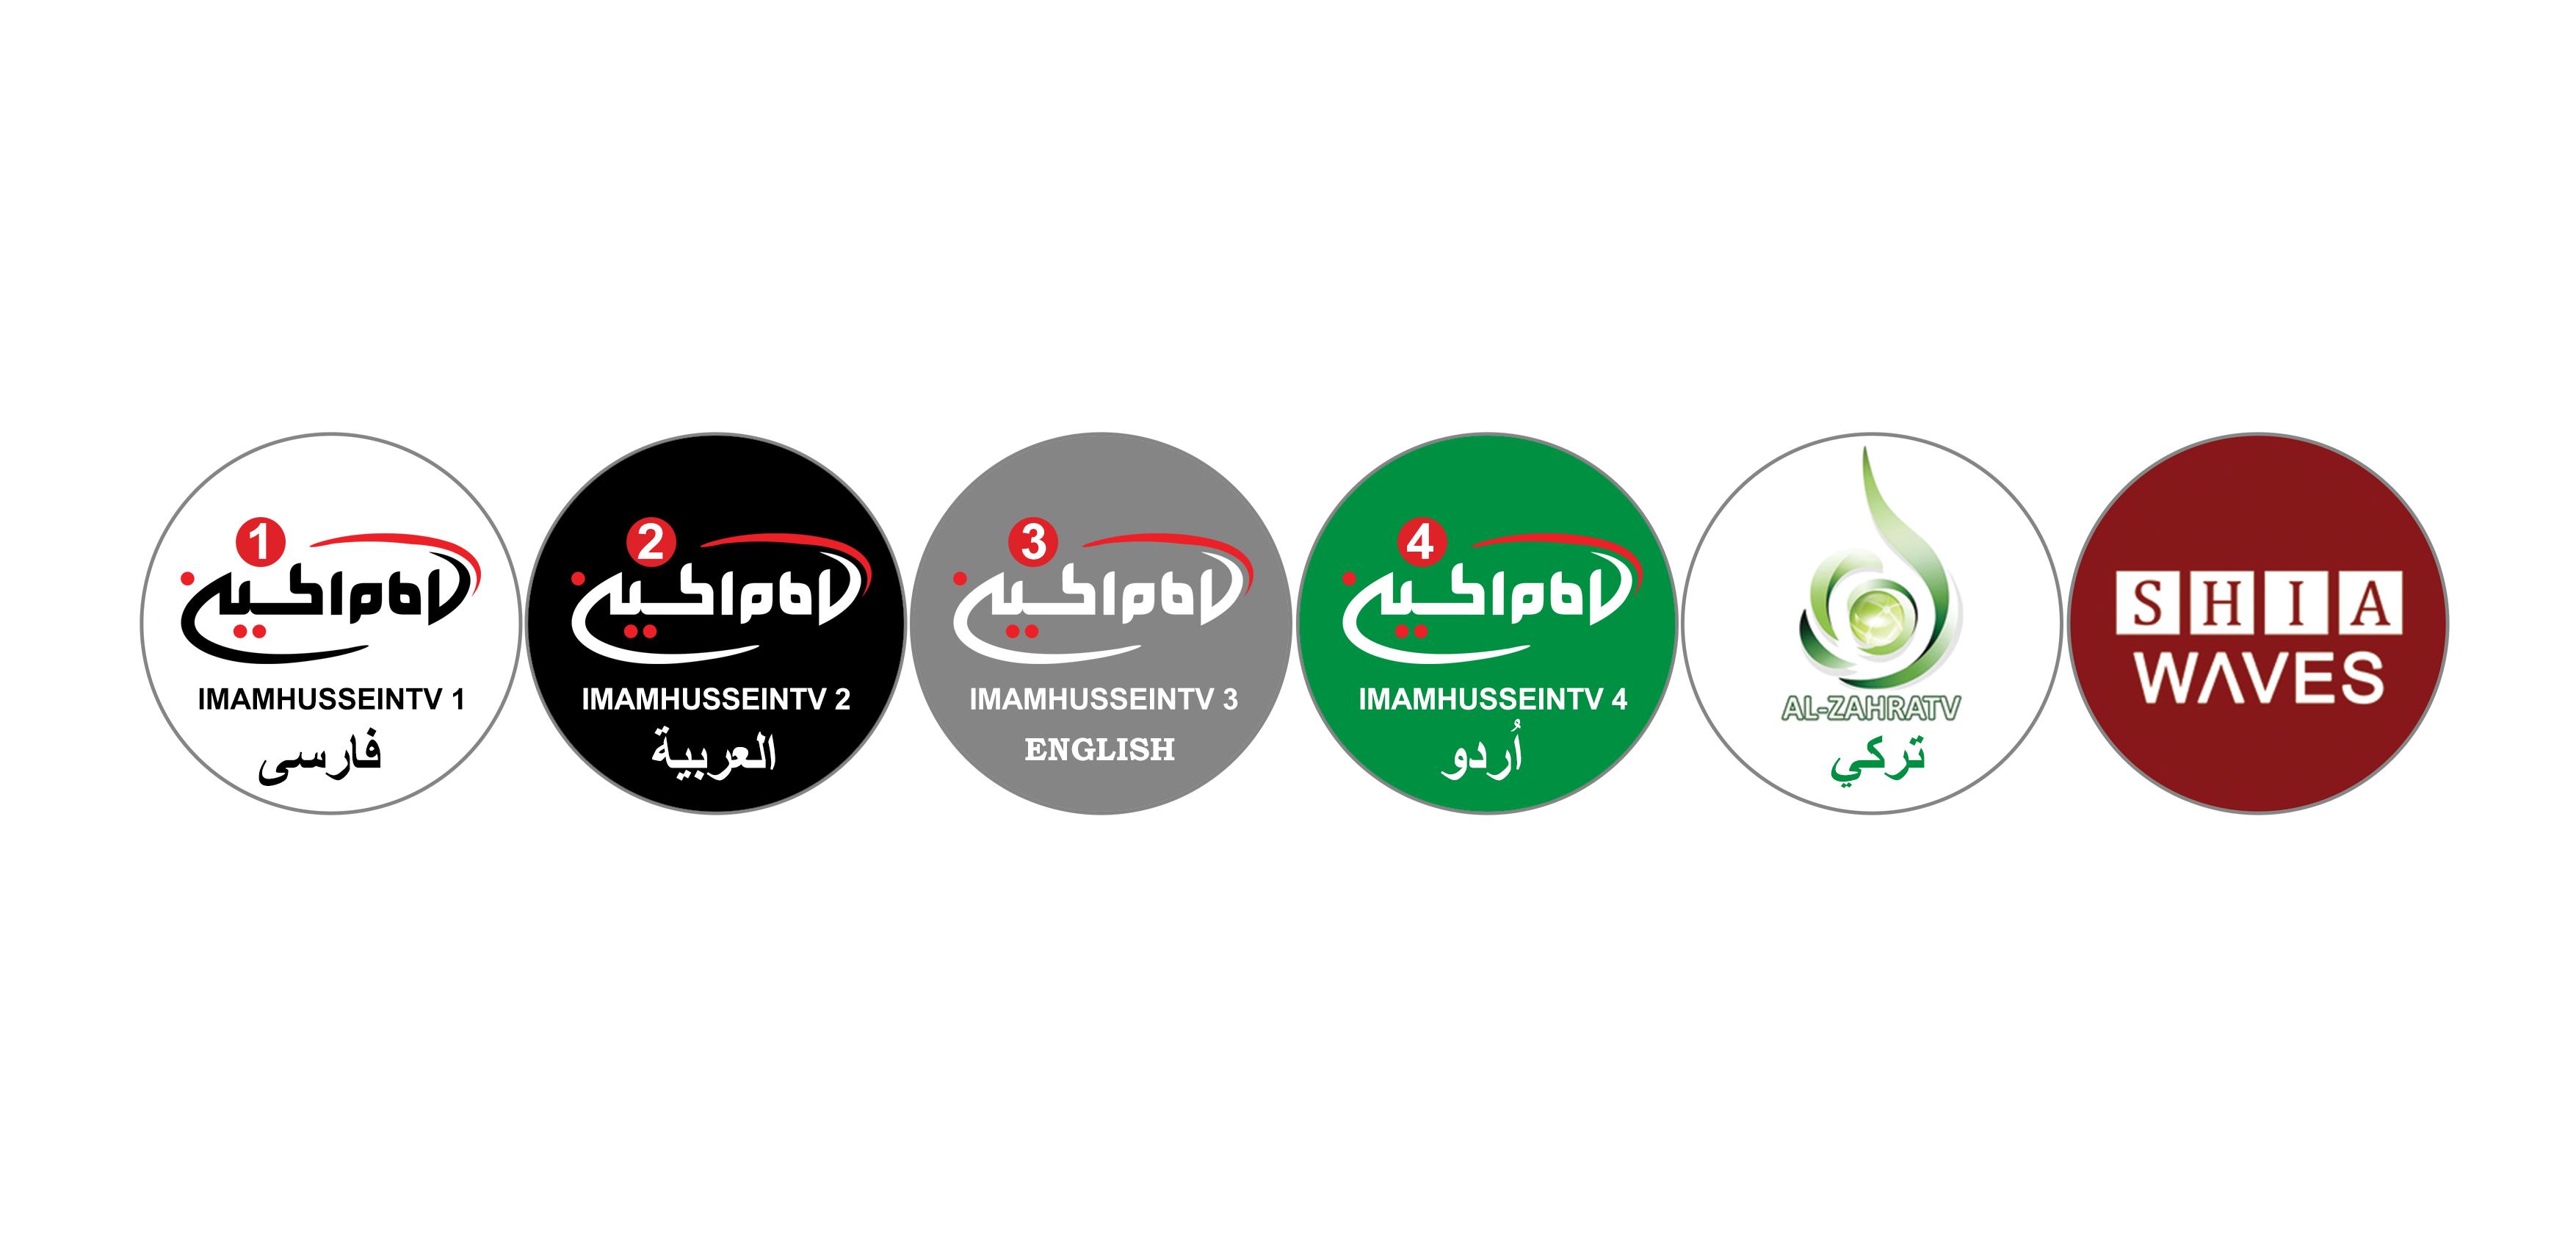 تصویر آغاز دهمين سال فعاليت «مجموعه رسانه اي امام حسين عليه السلام»